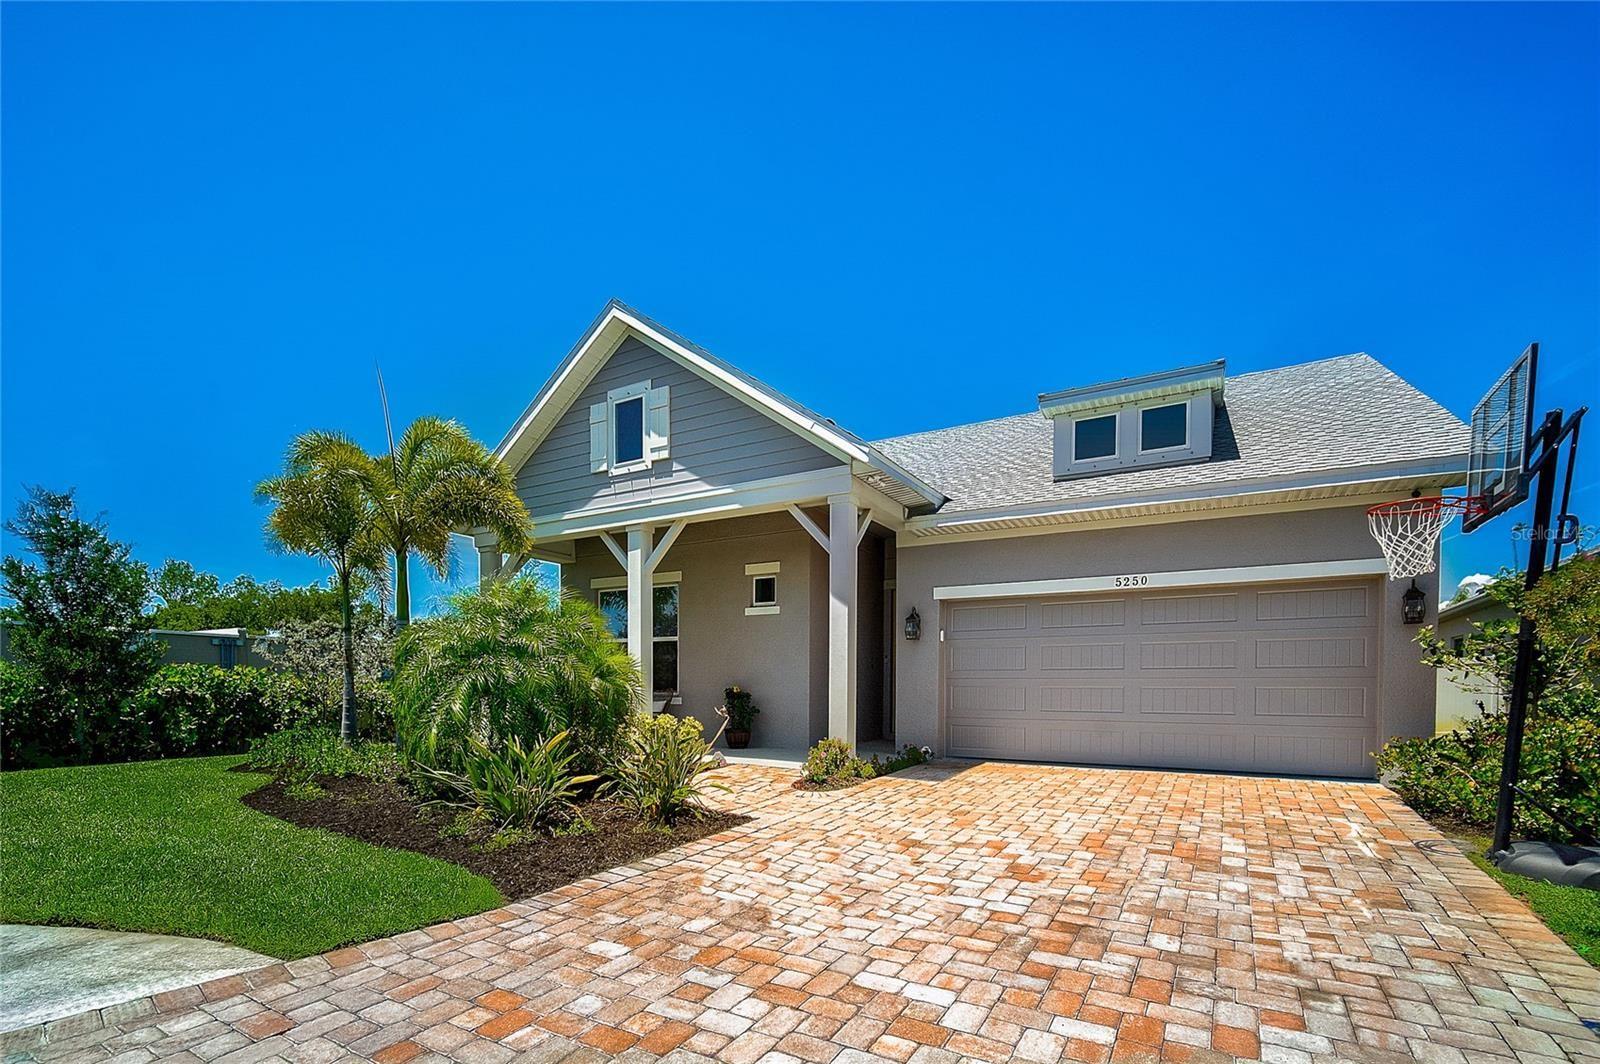 Photo for 5250 TWINFLOWER LANE, SARASOTA, FL 34233 (MLS # A4501739)